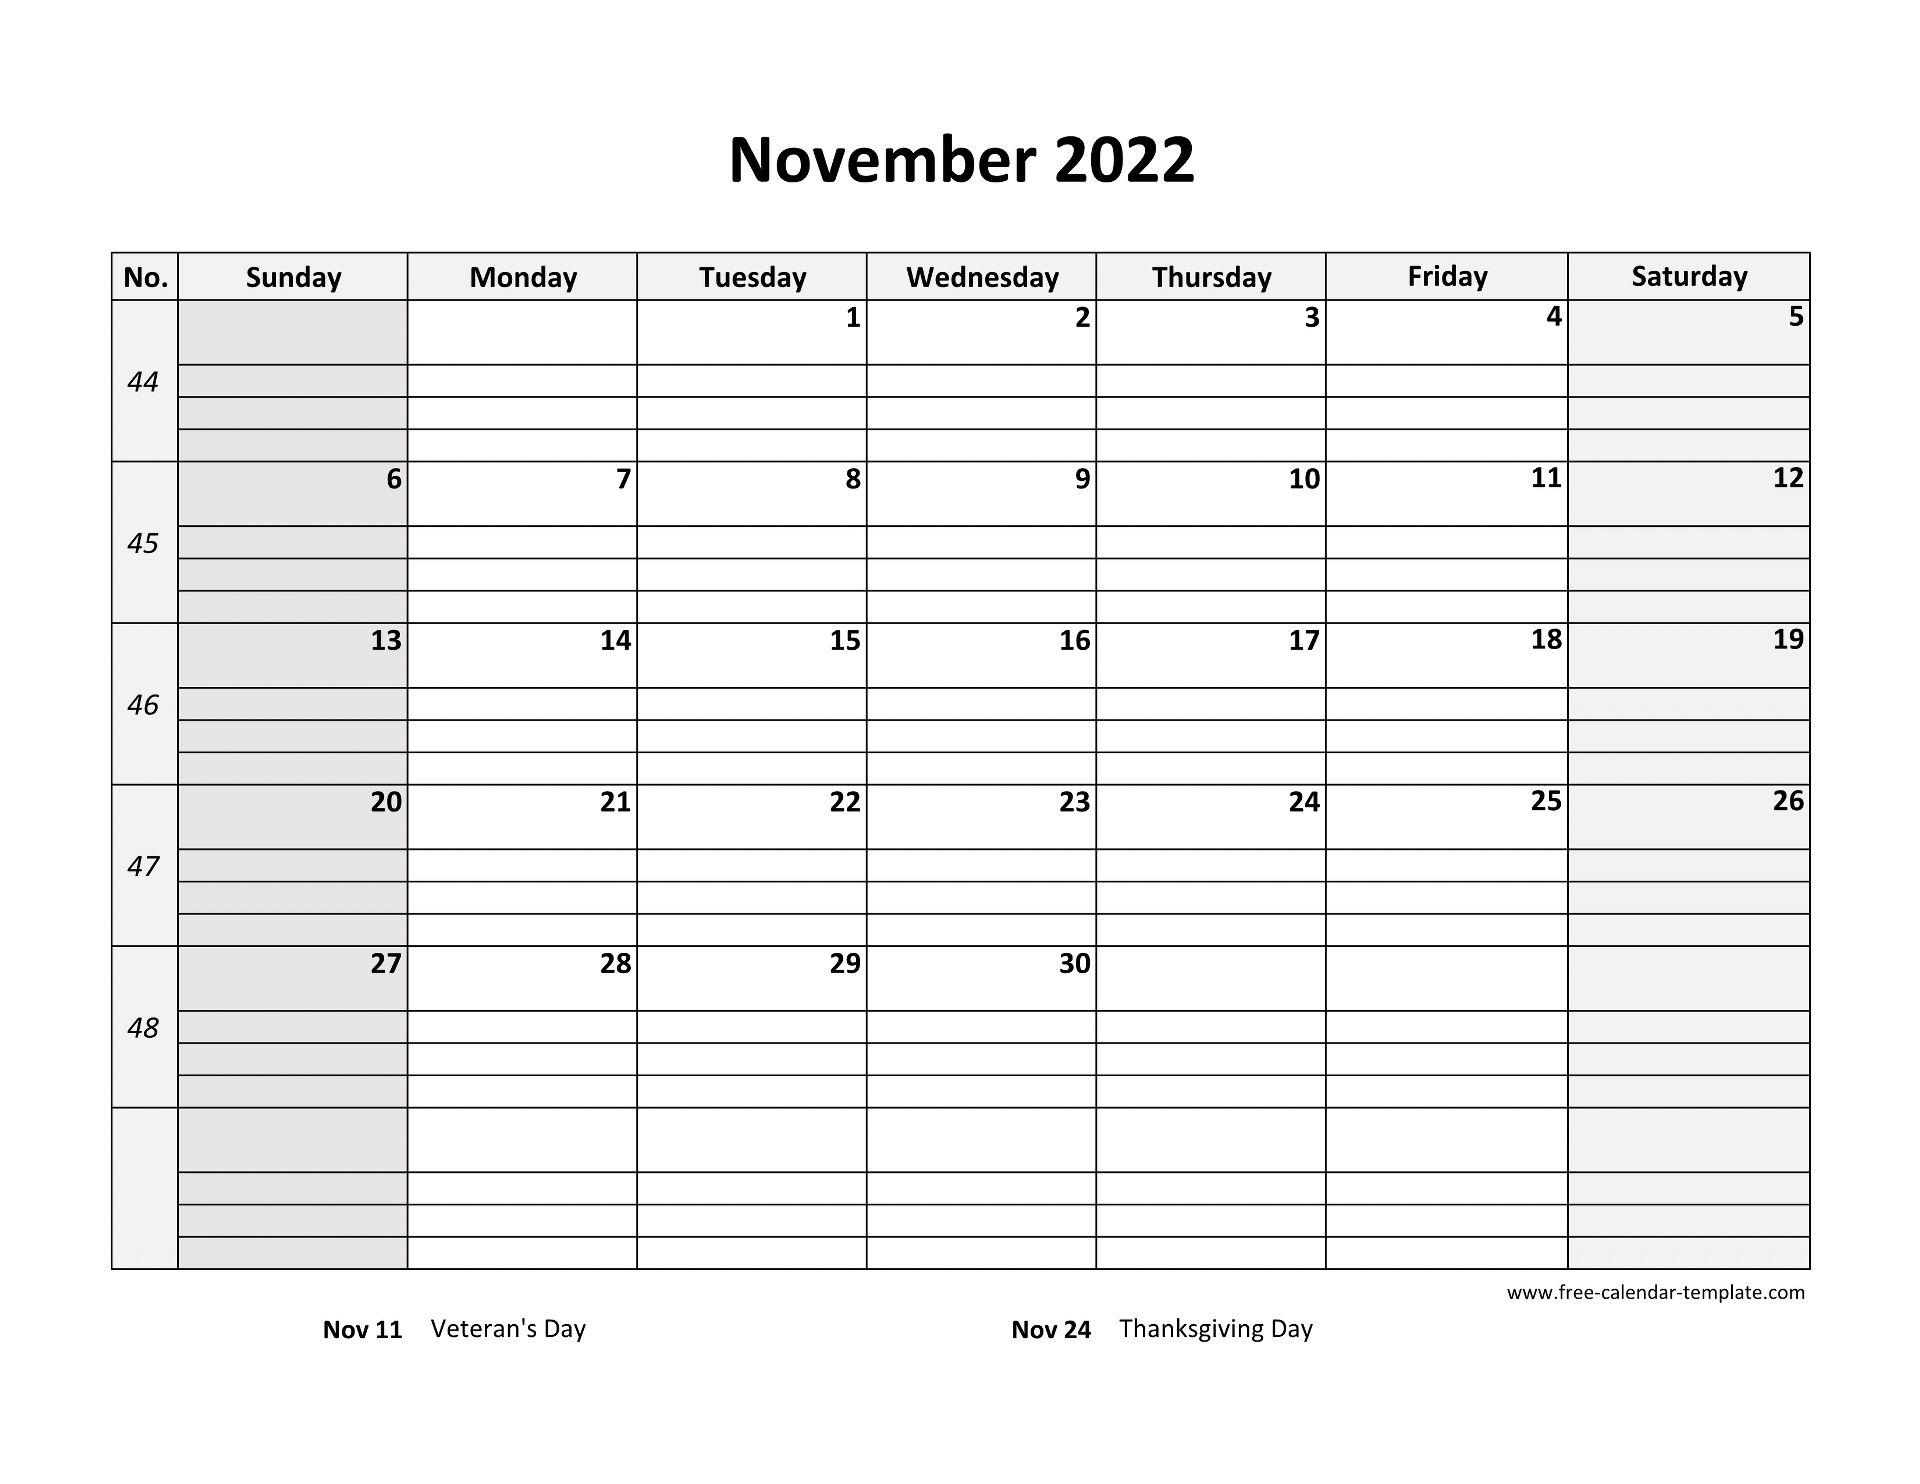 November 2022 Calendar Free Printable with grid lines ...